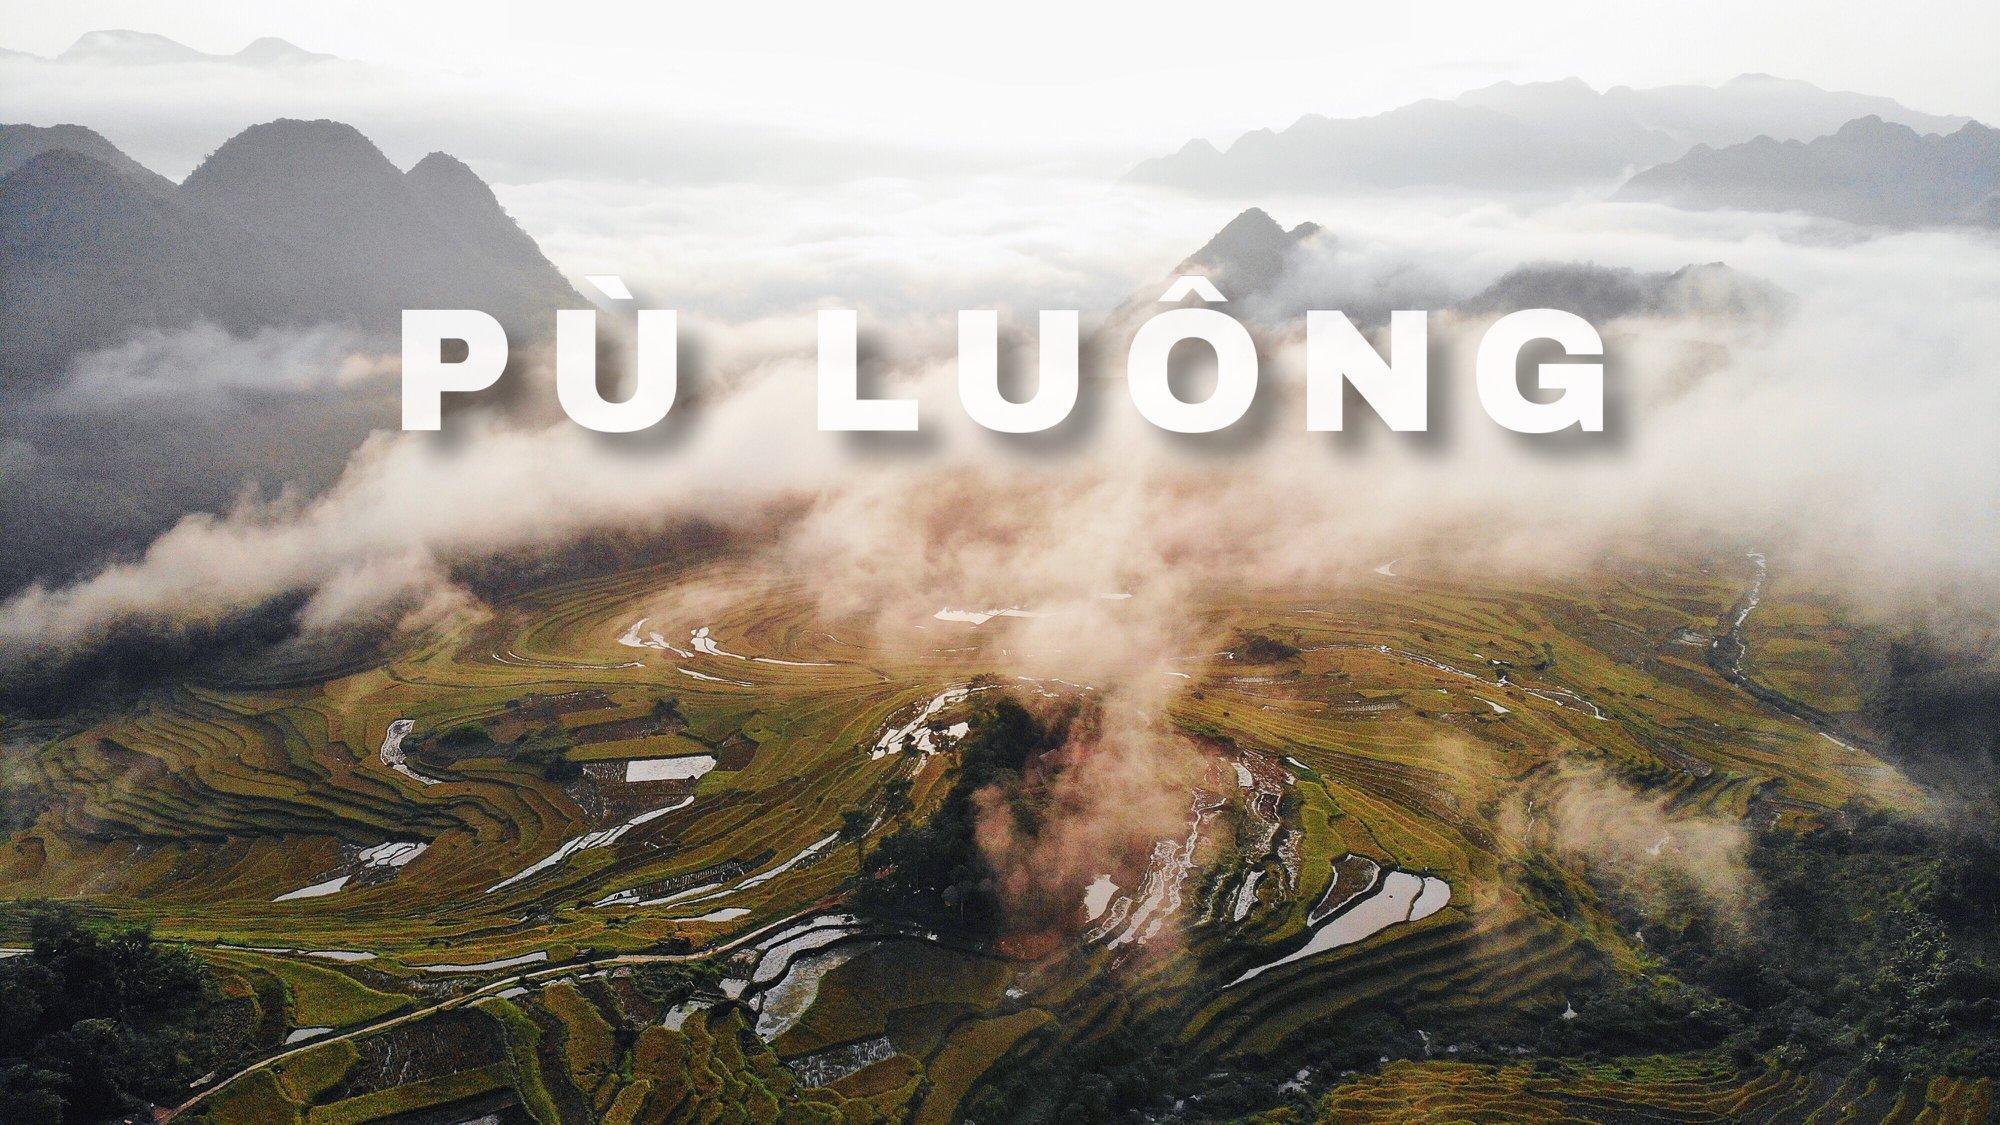 Tong-hop-nhung-dia-diem-du-lich-nui-hot-nhat-trong-dip-30-thang-4-vietmountain-travel096801123456